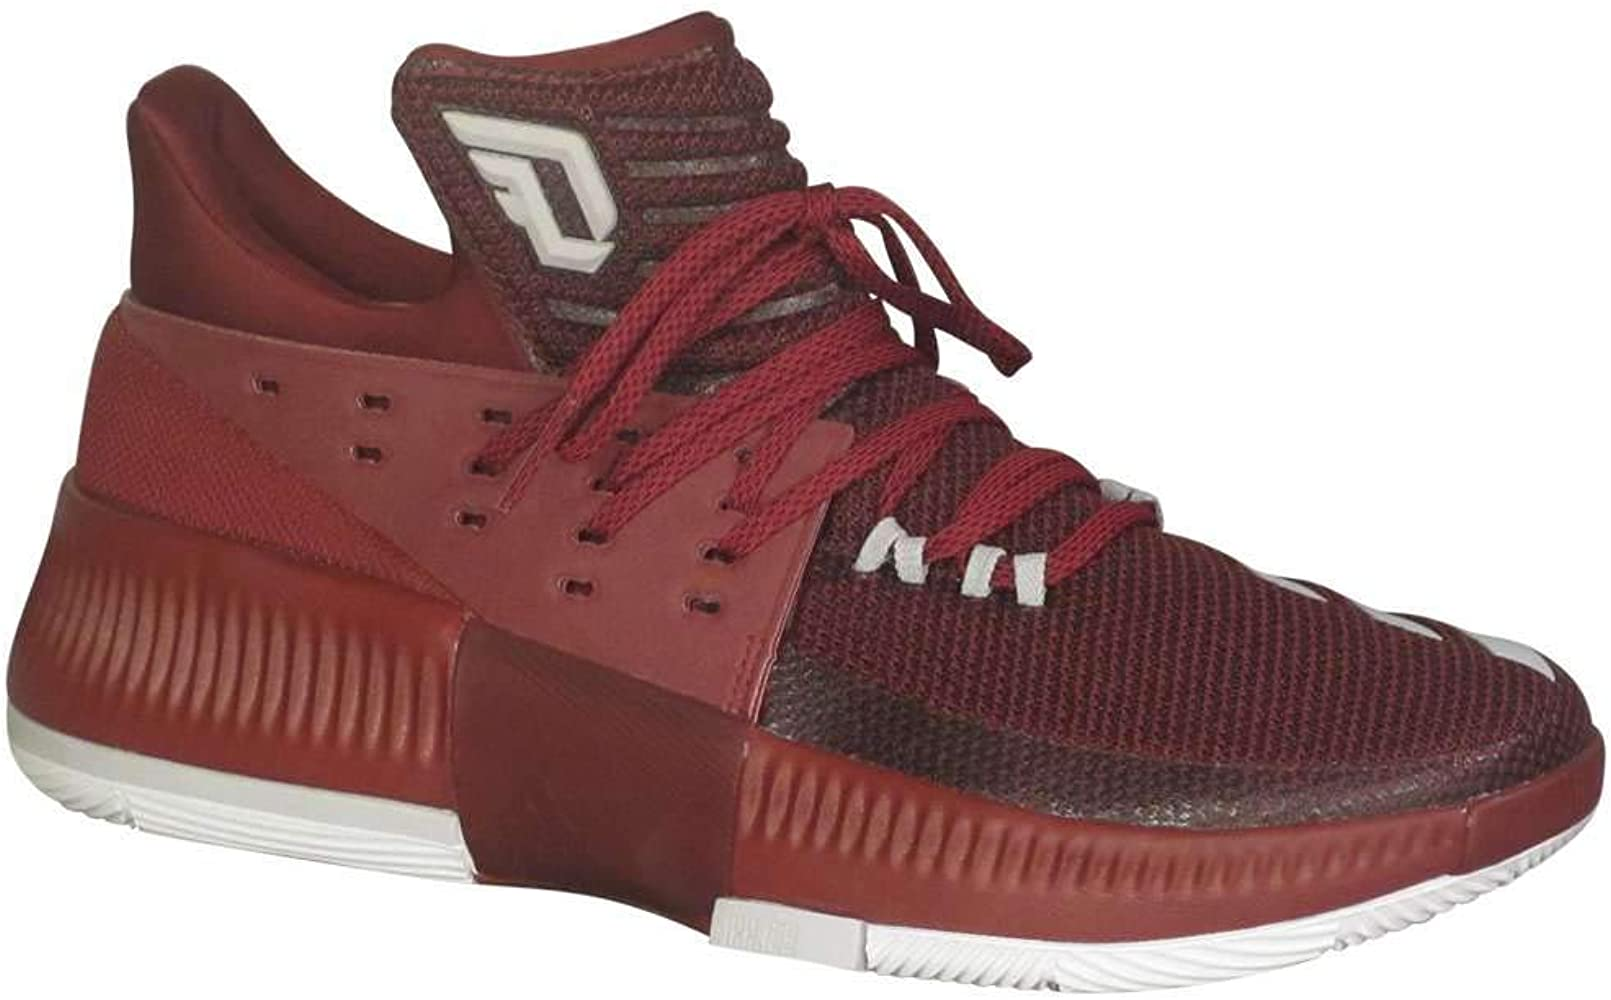 Adidas Dame 3 Shoe Men's Basketball 10